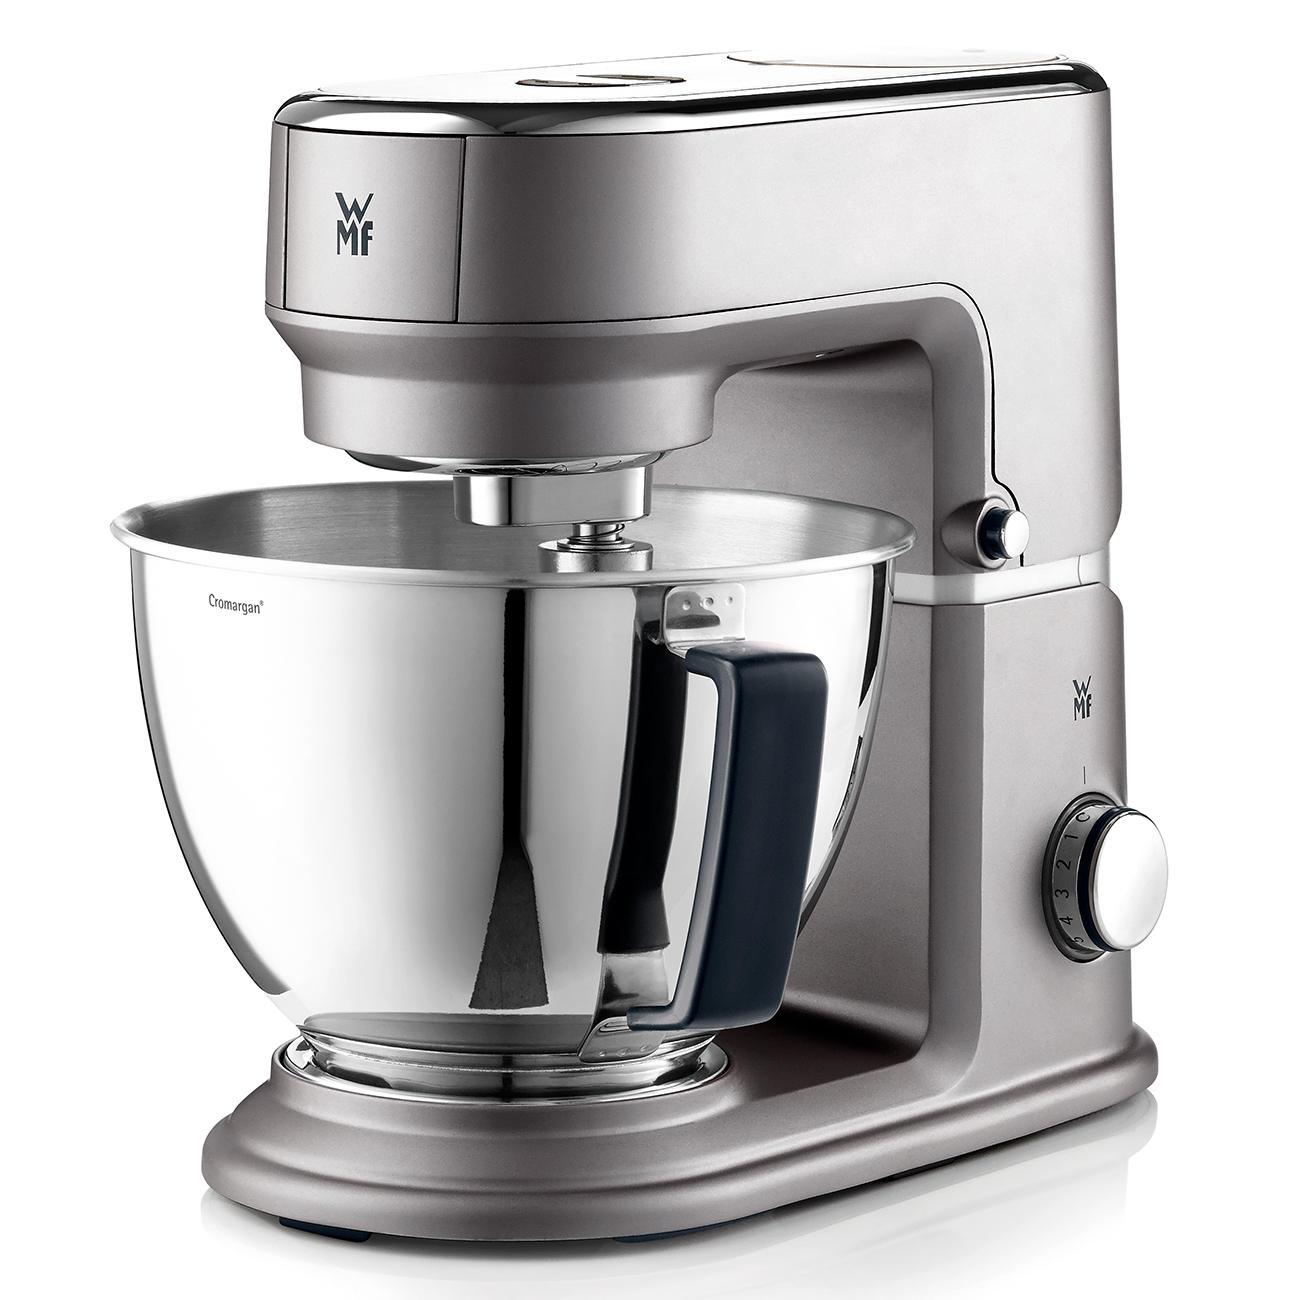 Acheter robot m nager wmf k chenminis en ligne pas cher for Robot de cuisine professionnel